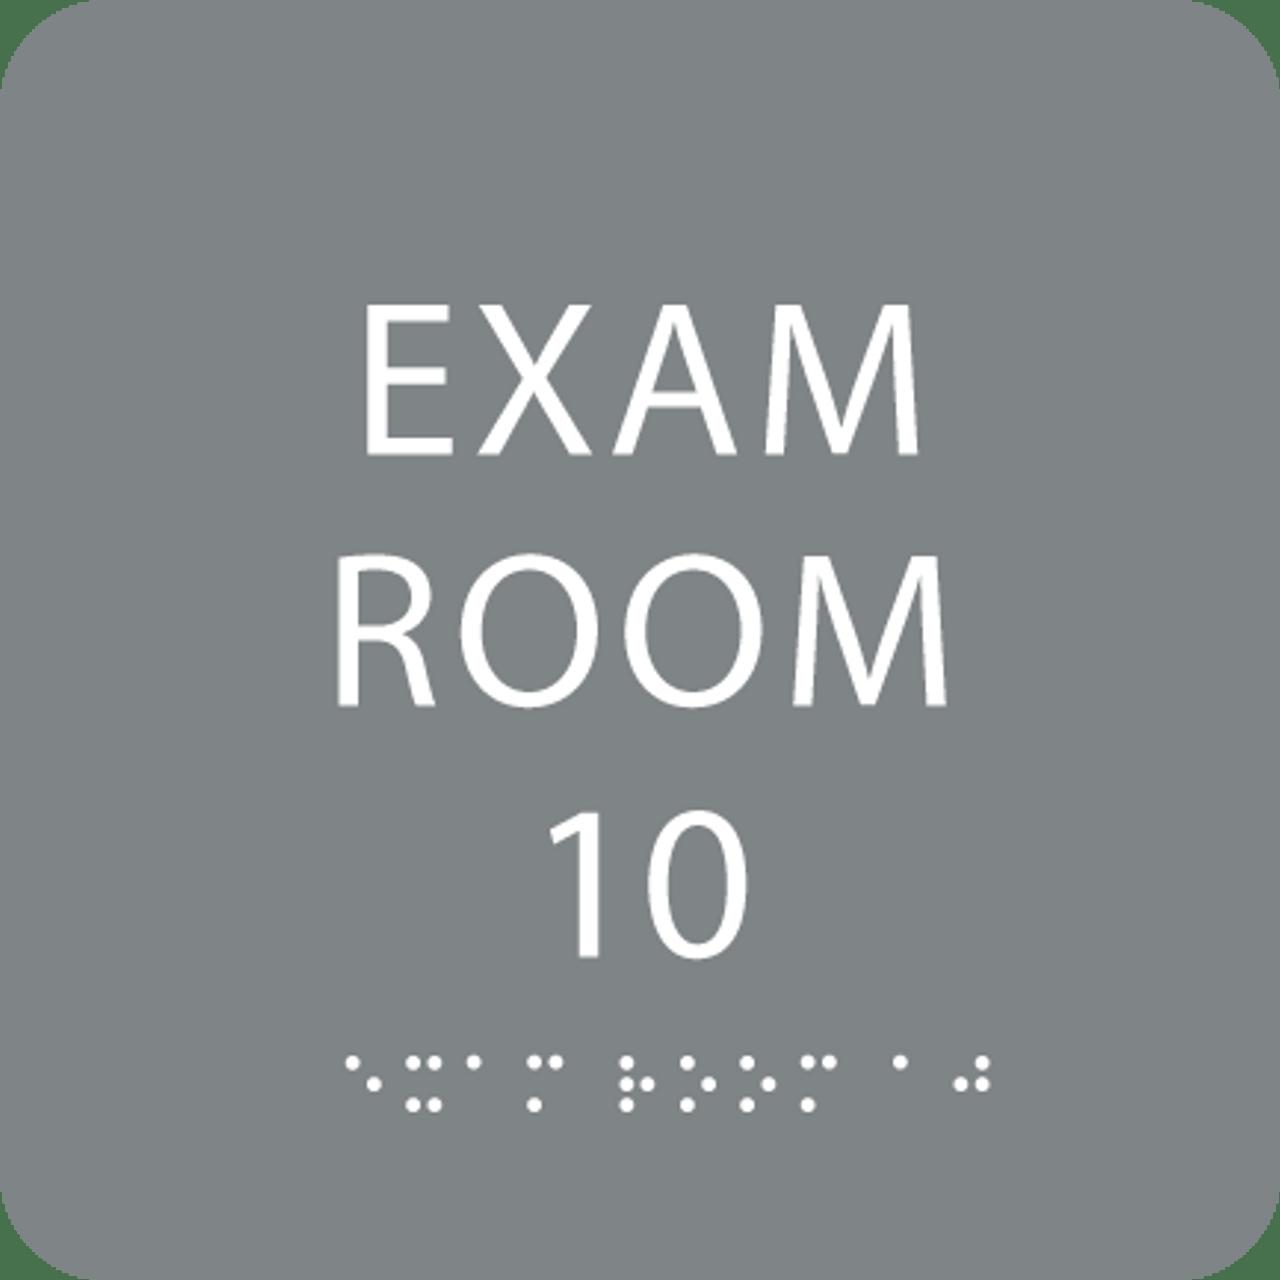 Grey Exam Room 10 Sign w/ ADA Braille